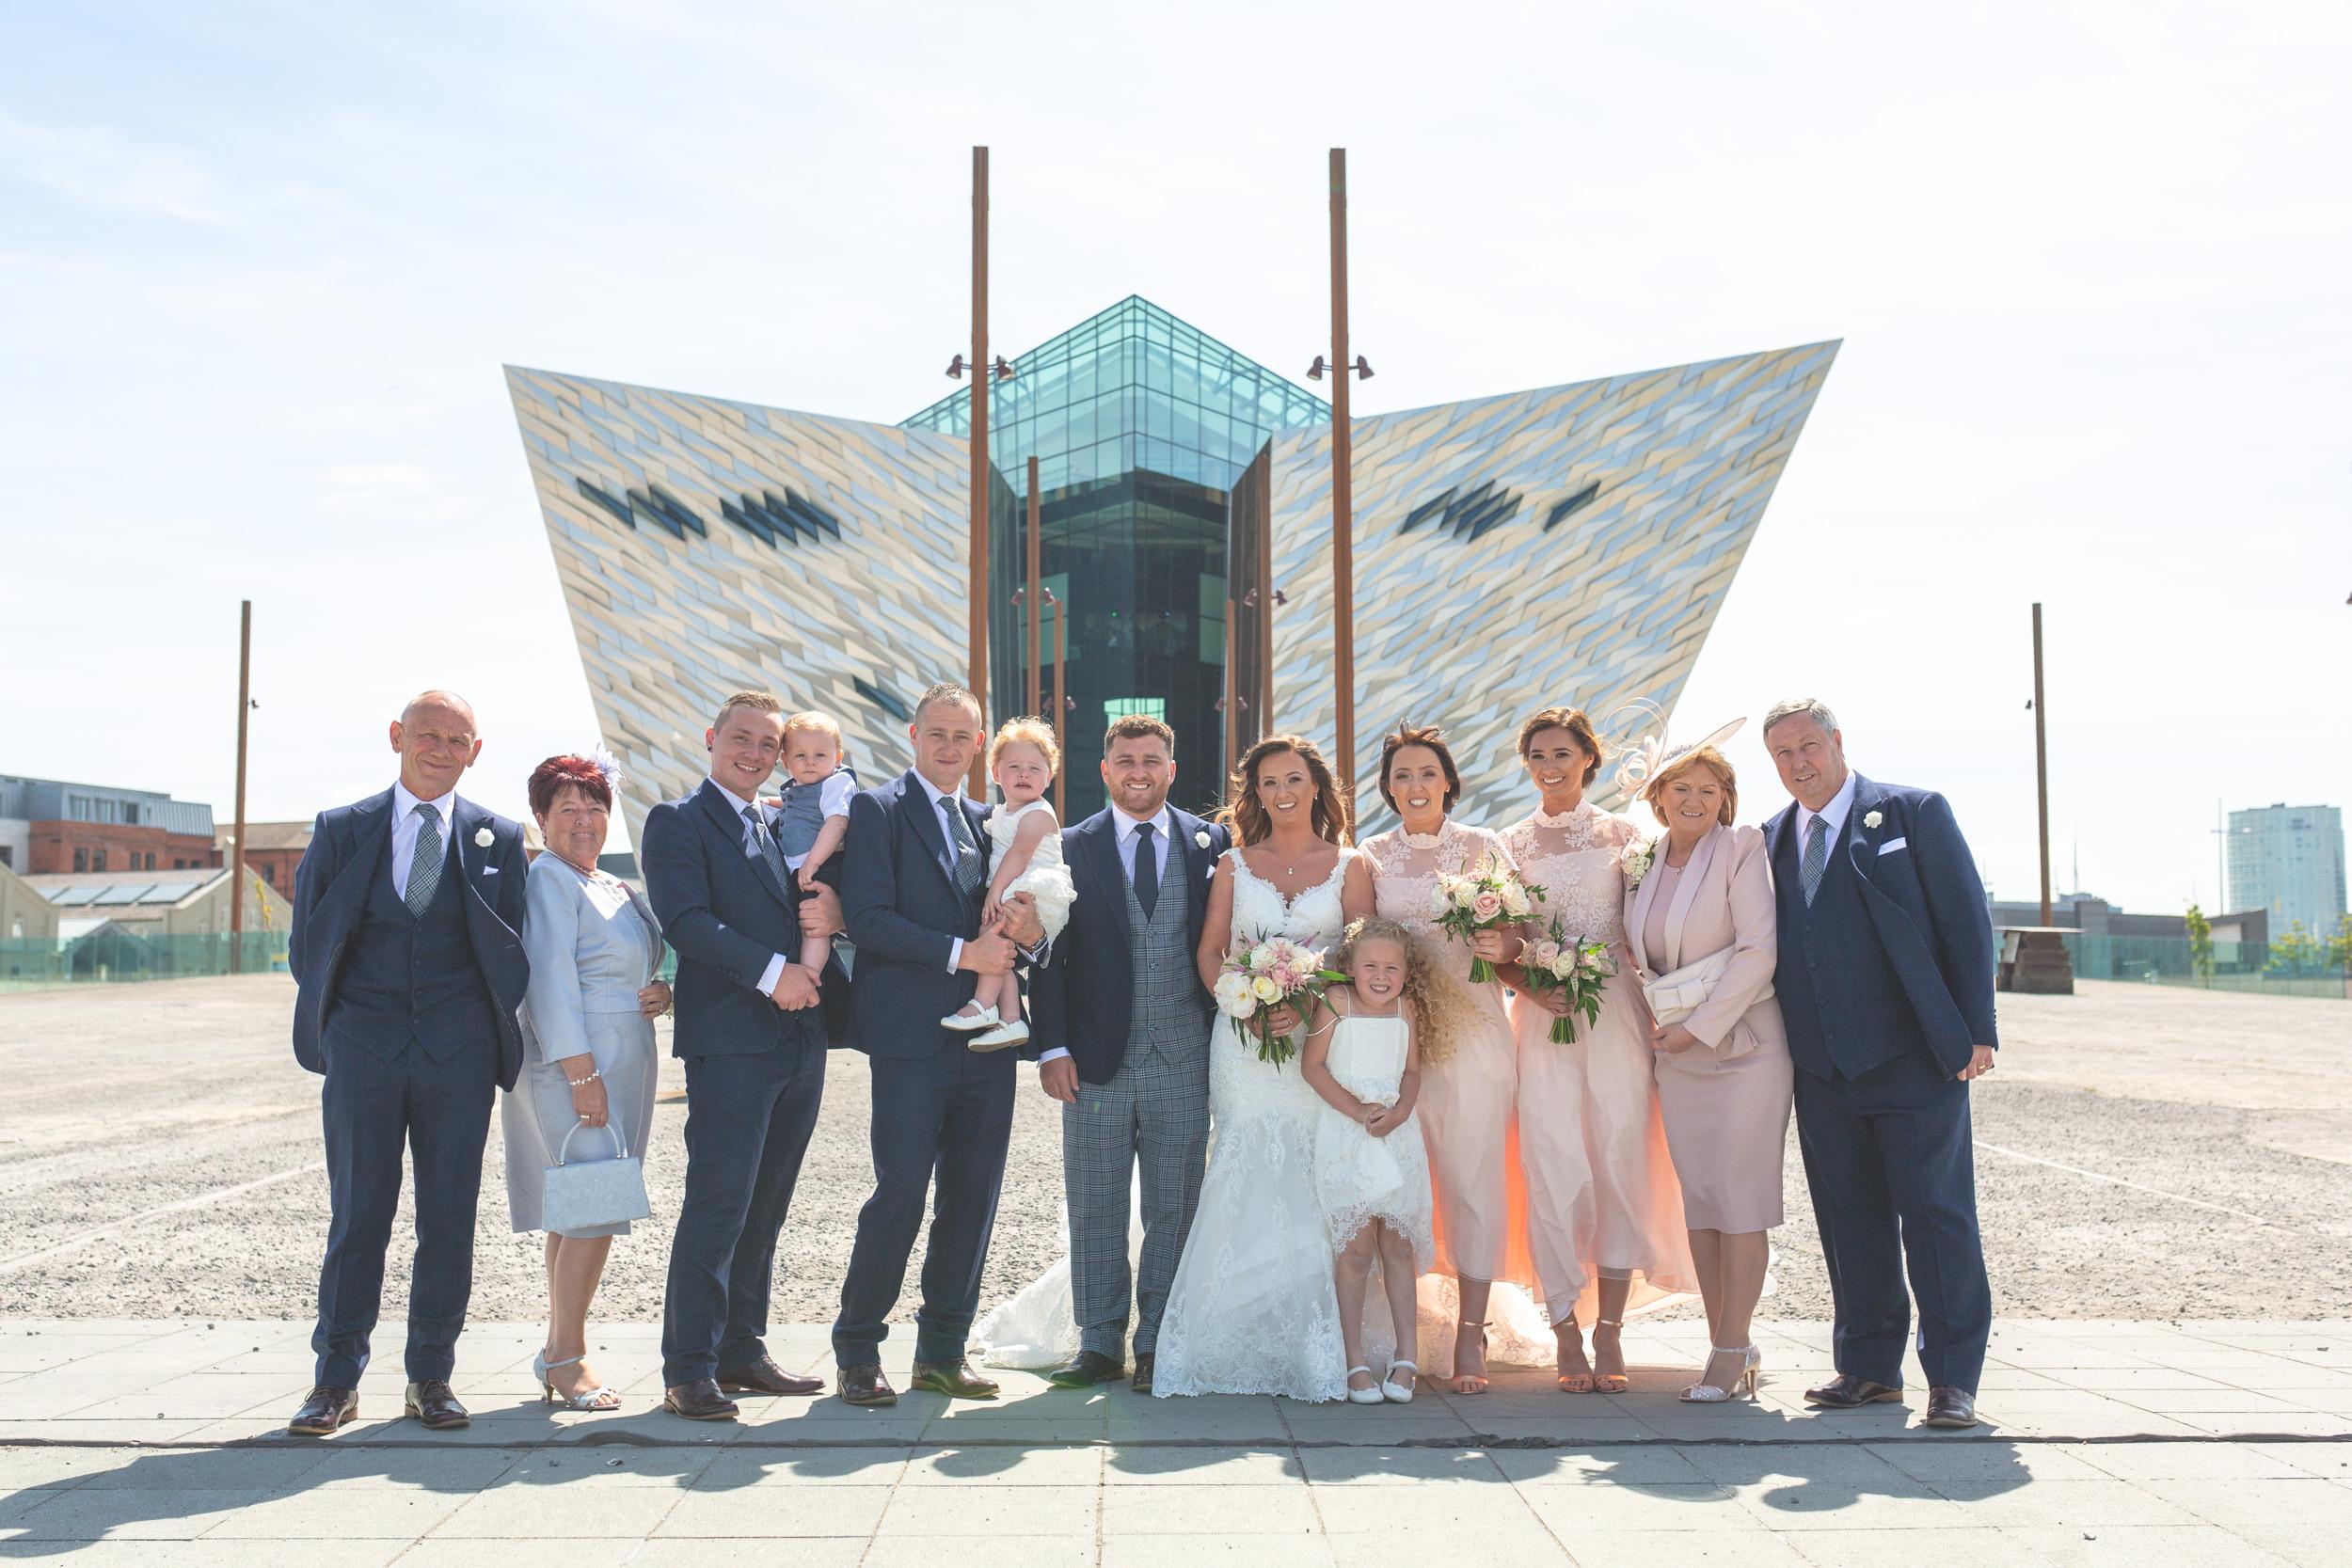 Brian McEwan   Northern Ireland Wedding Photographer   Rebecca & Michael   Portraits-20.jpg